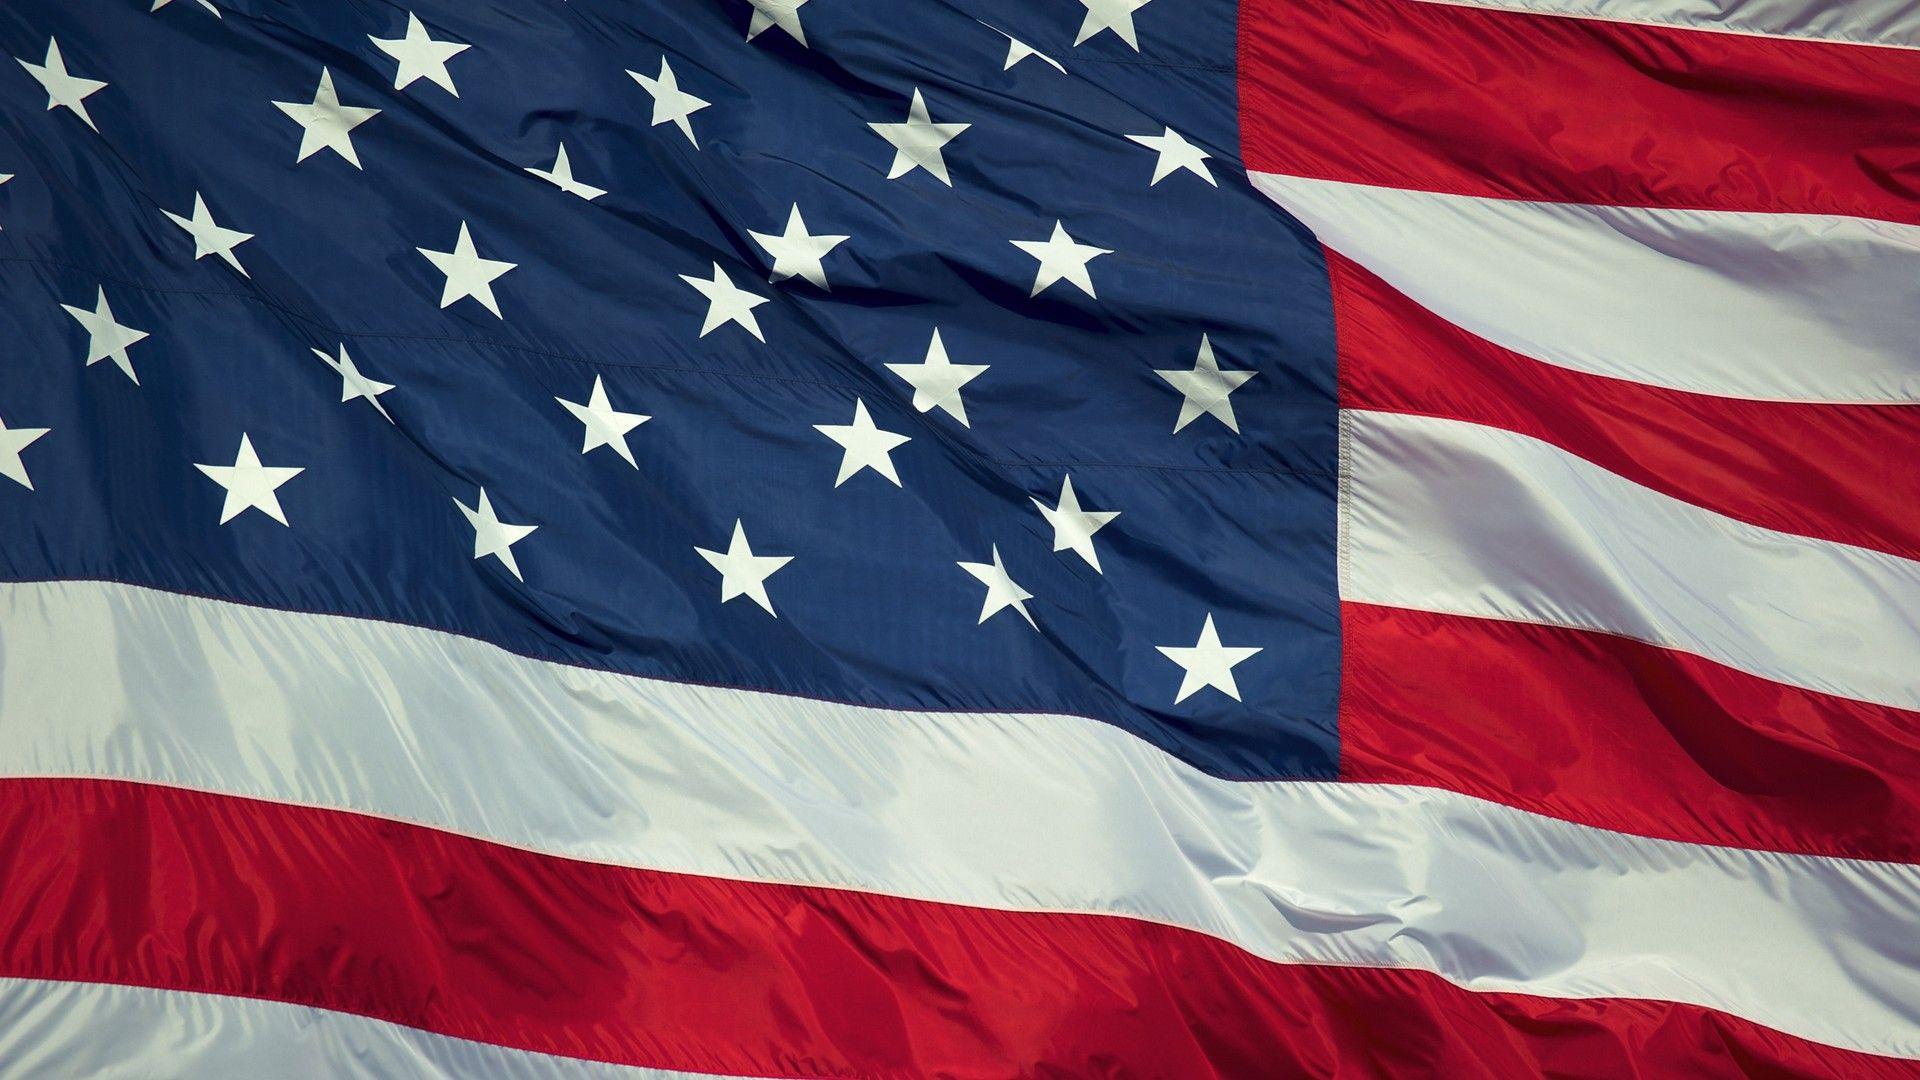 America Flag download wallpaper image